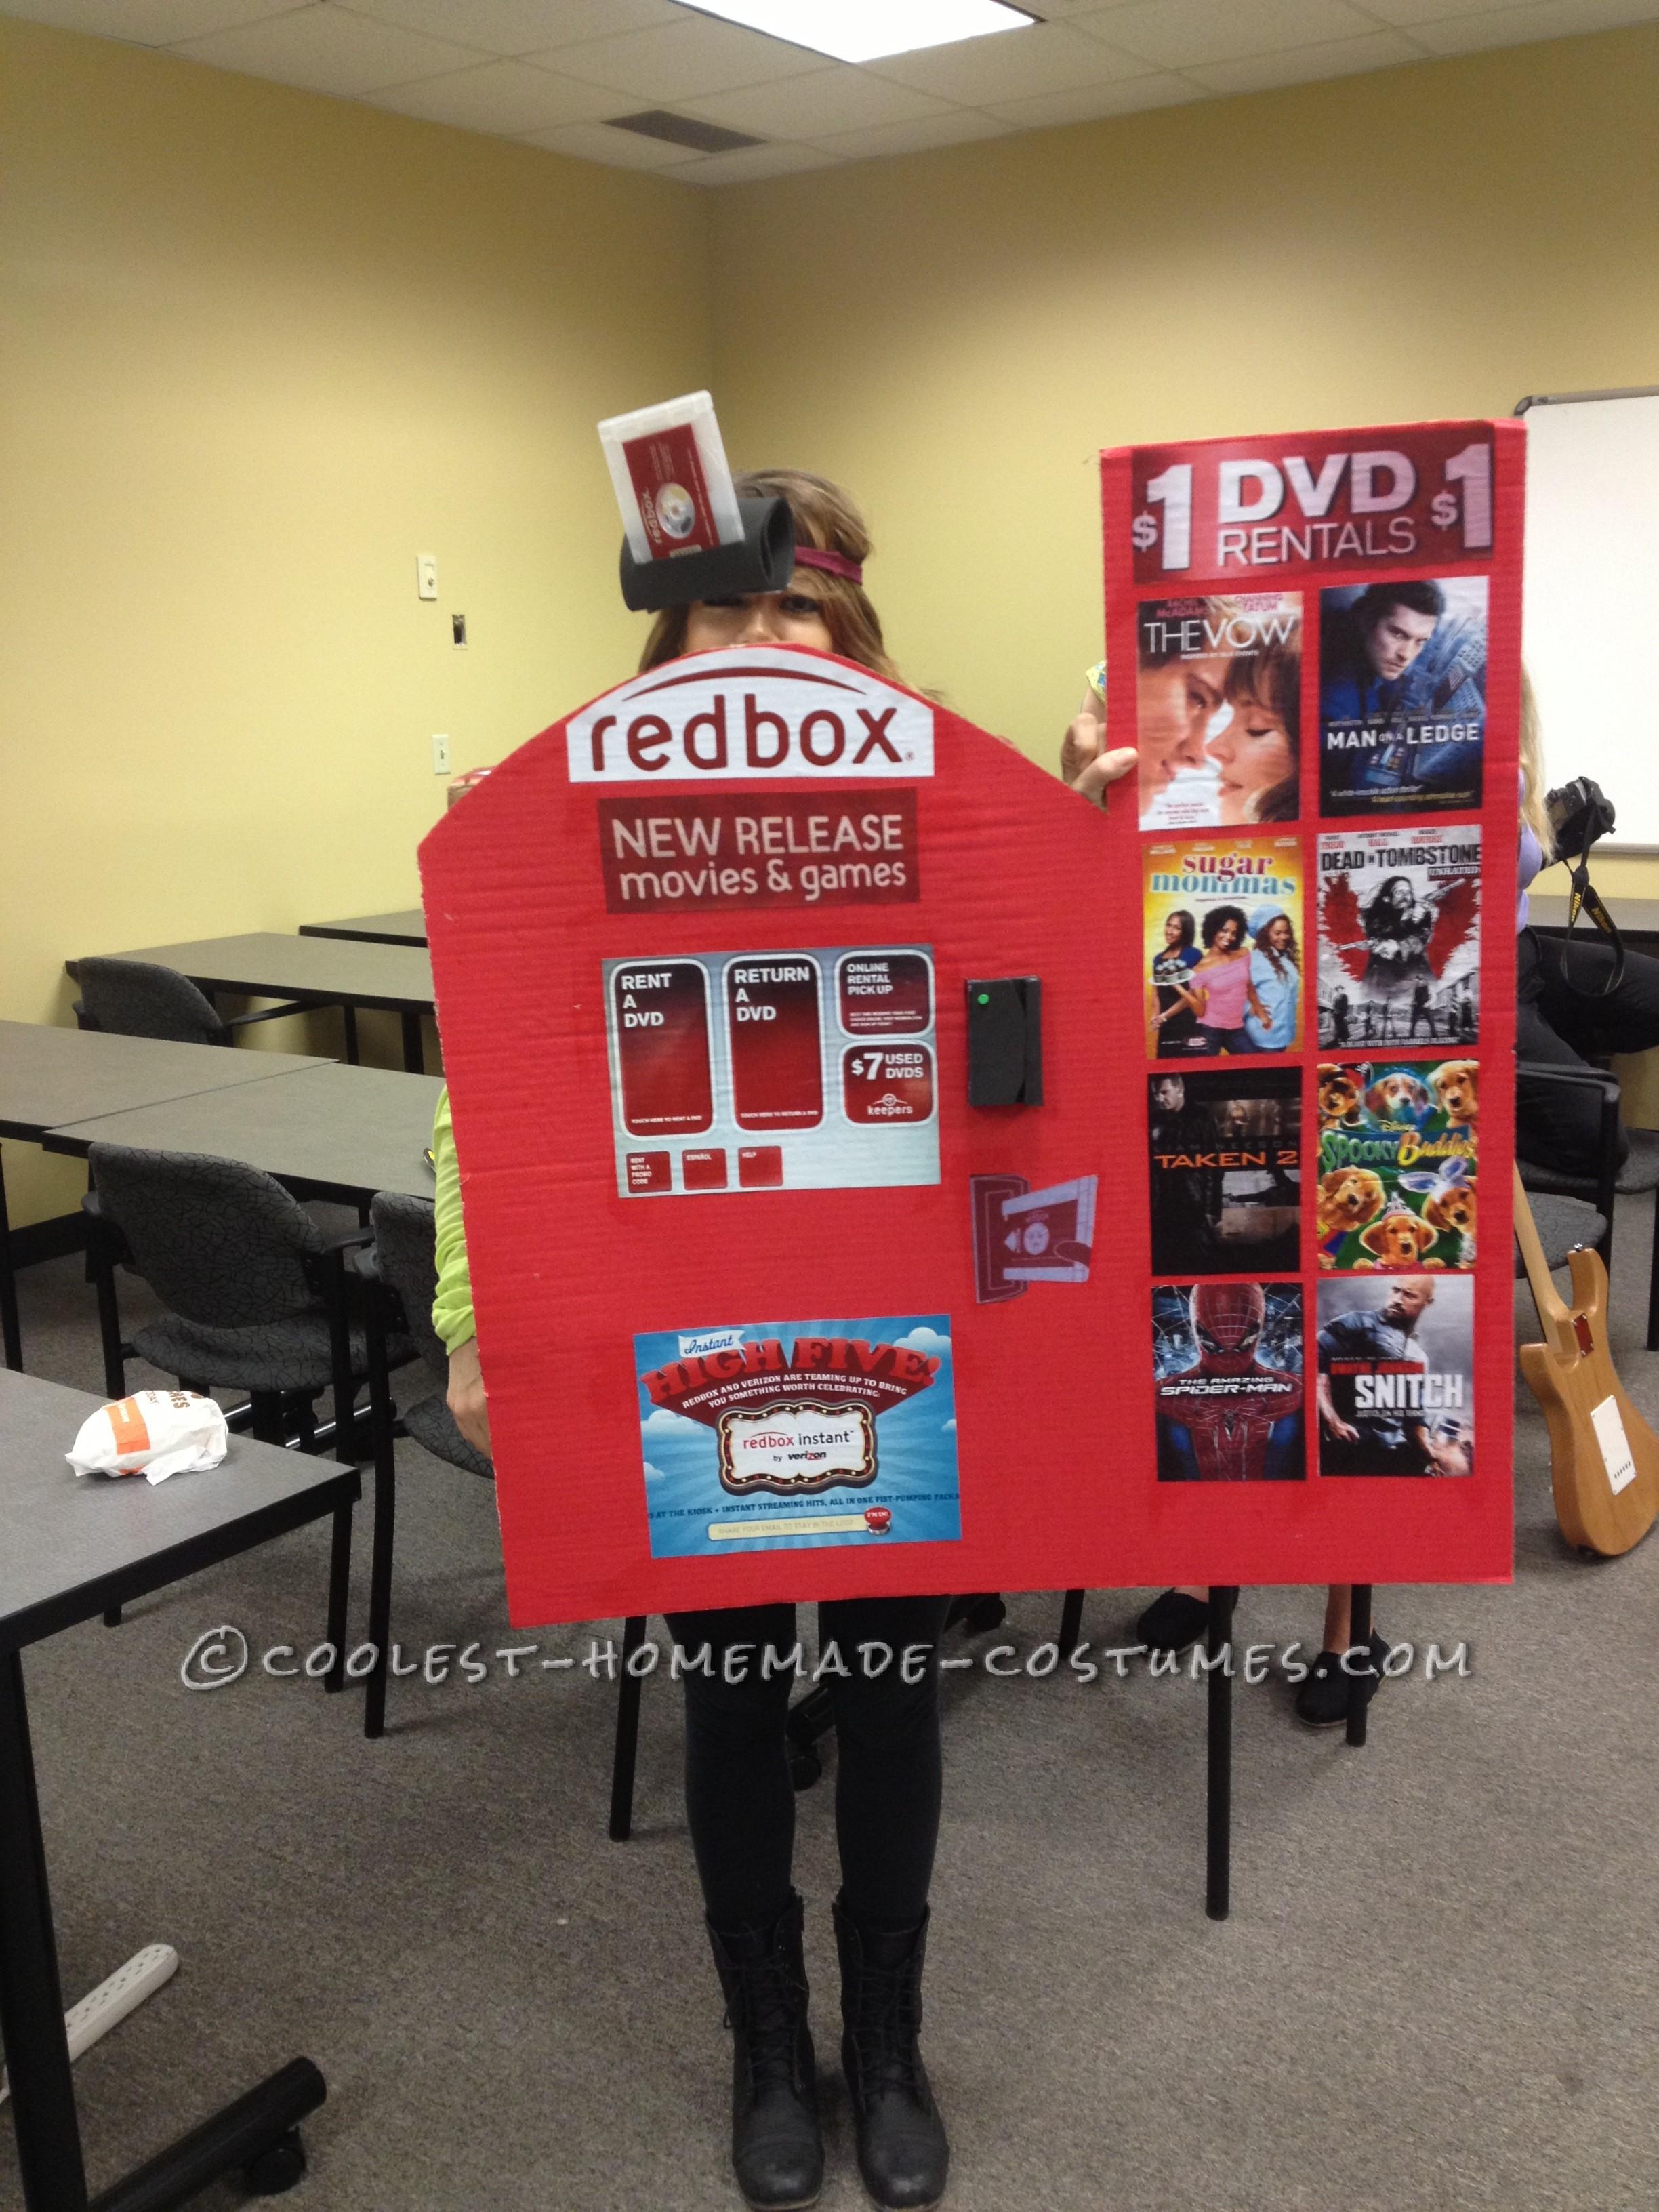 Cool Redbox DVD Kiosk Costume